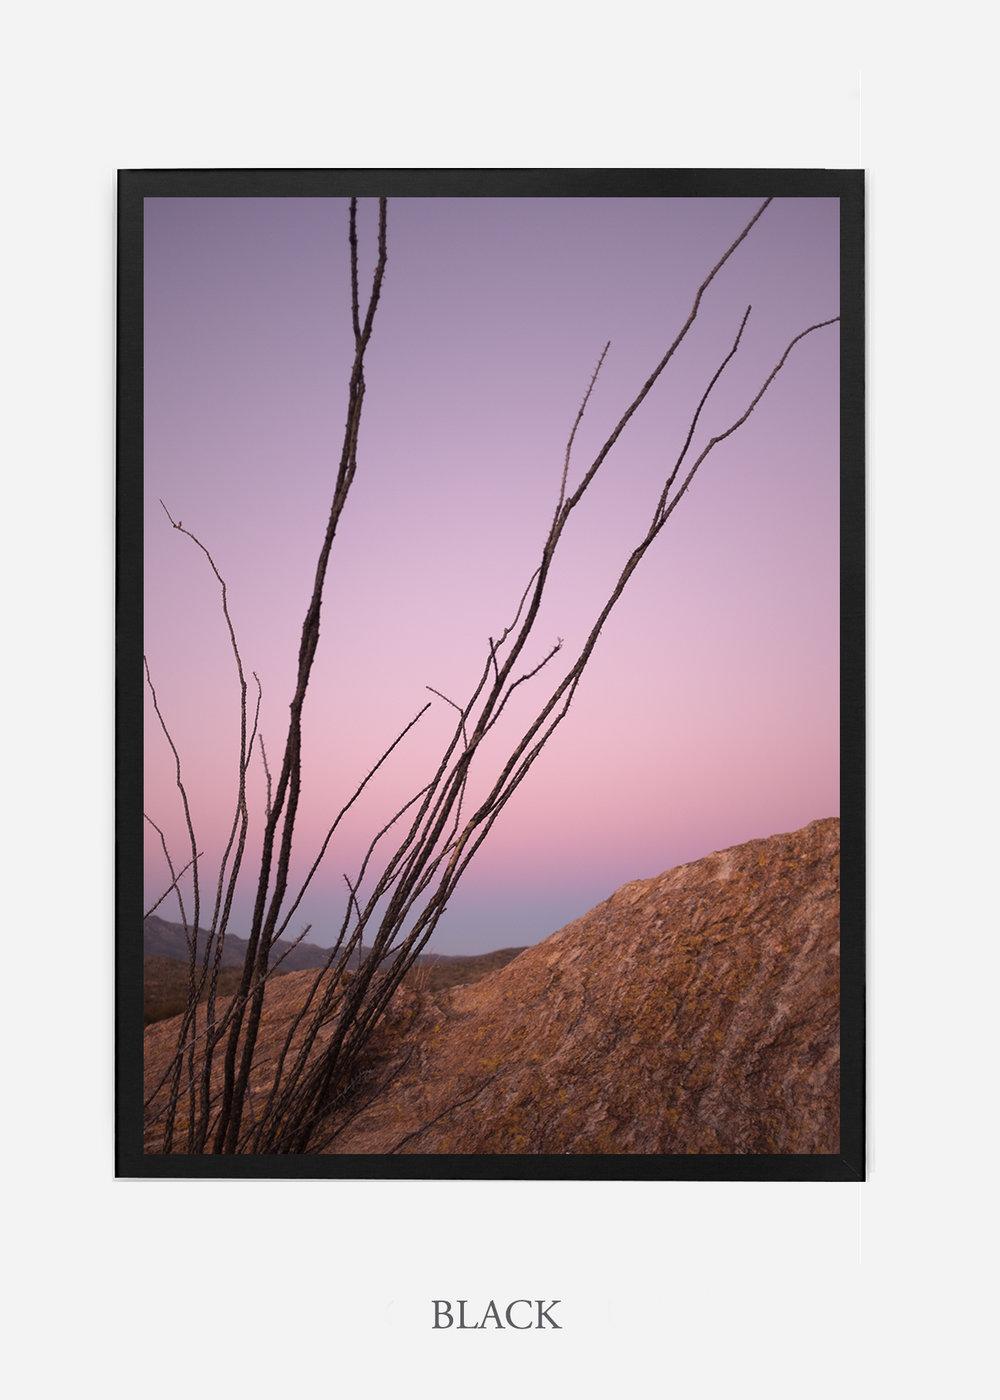 nomat-blackframe-saguaroNo.12-wildercalifornia-art-wallart-cactusprint-homedecor-prints-arizona-botanical-artwork-interiordesign.jpg